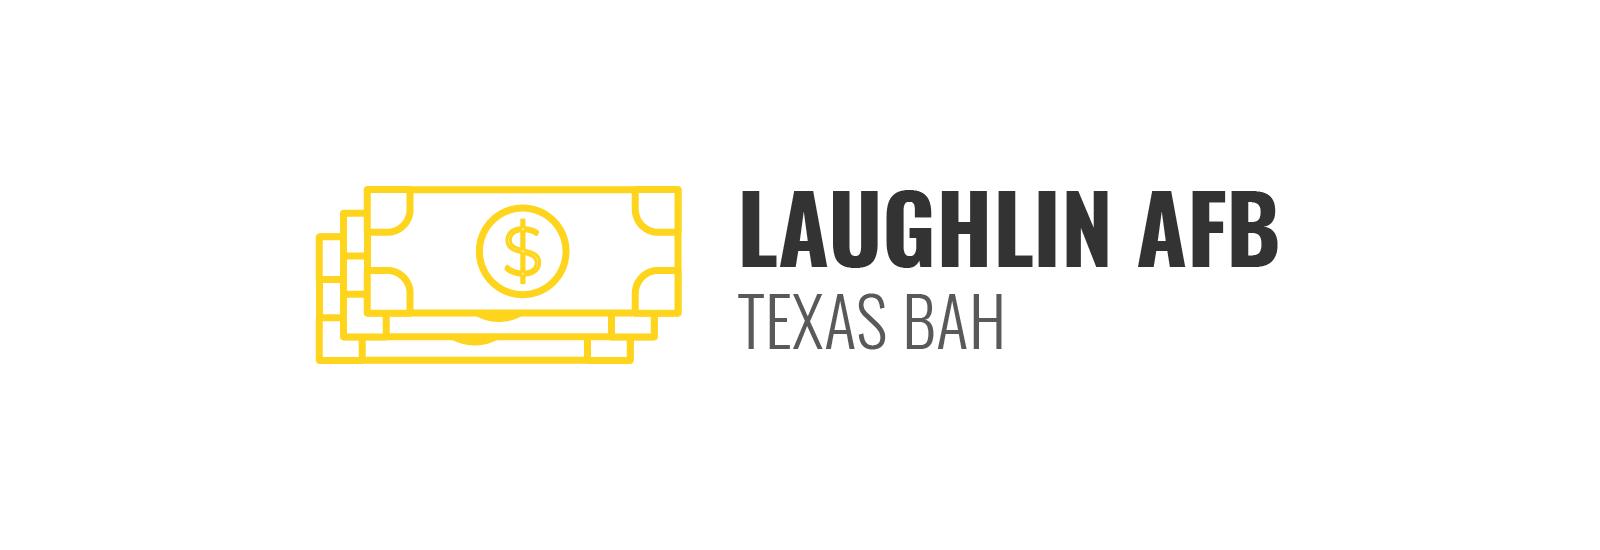 Texas BAH